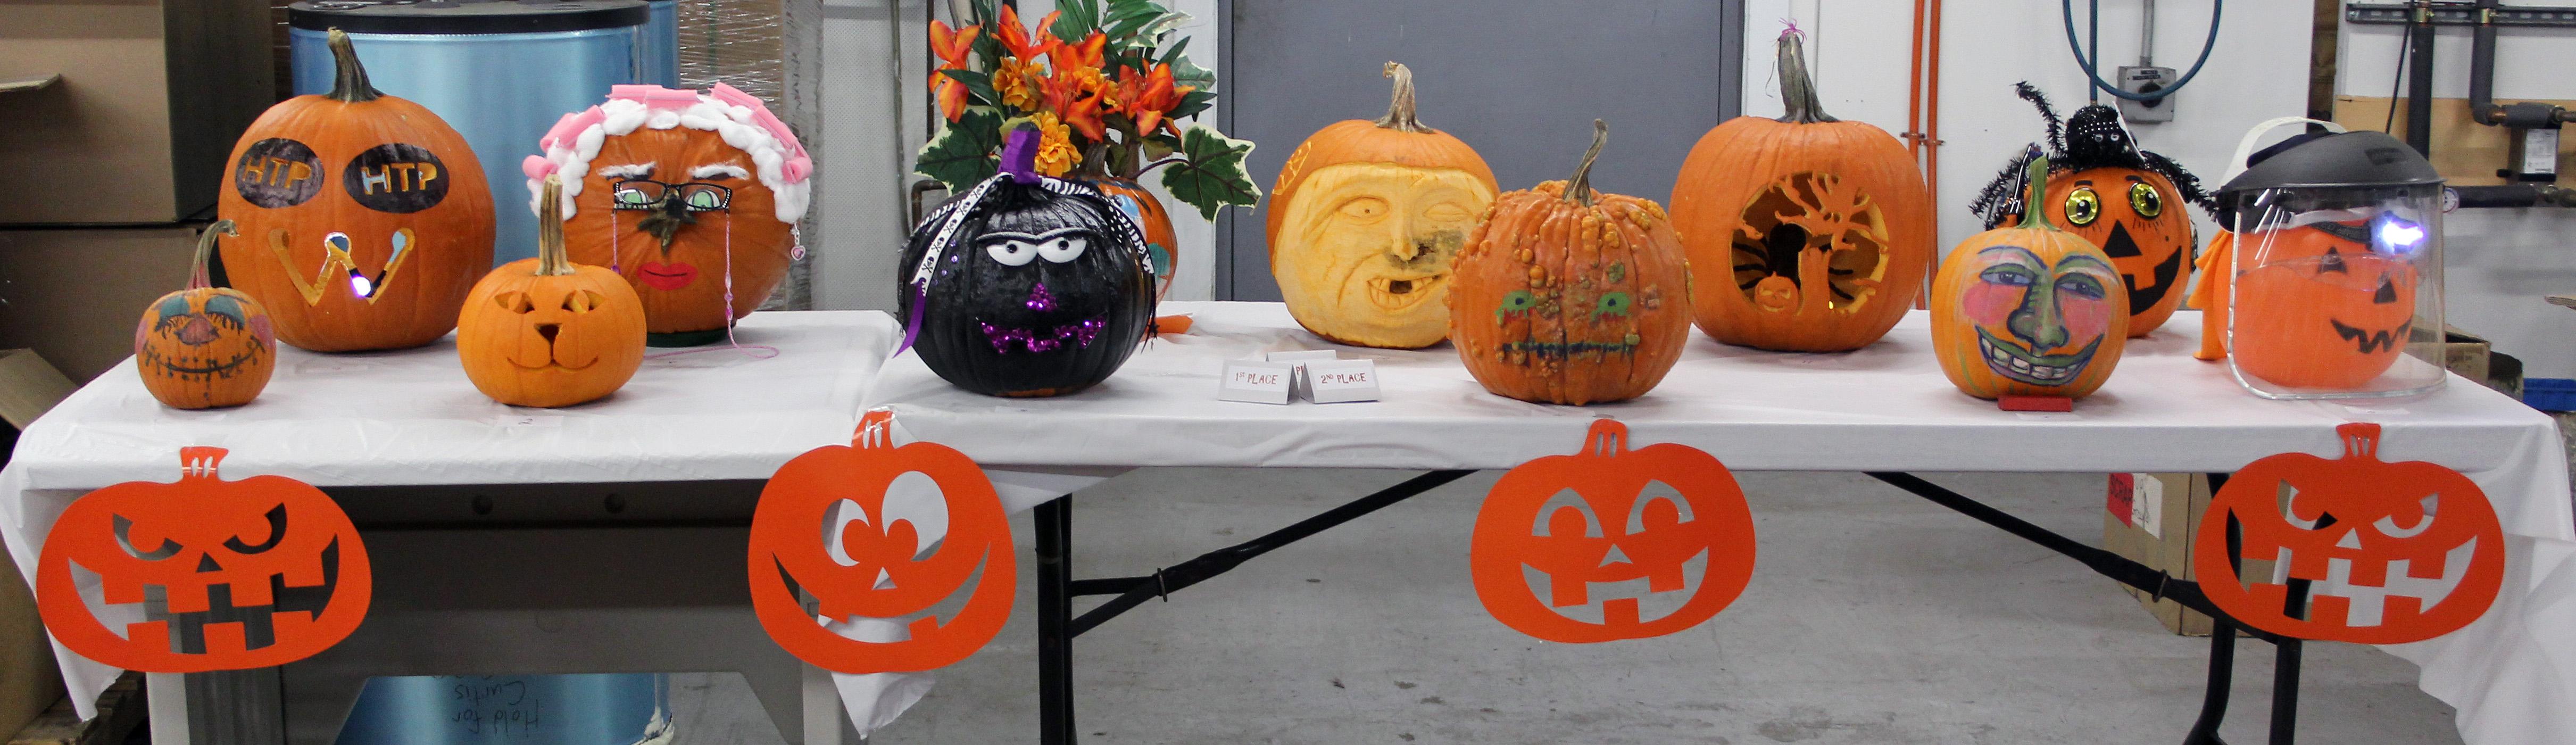 pumpkin_contest